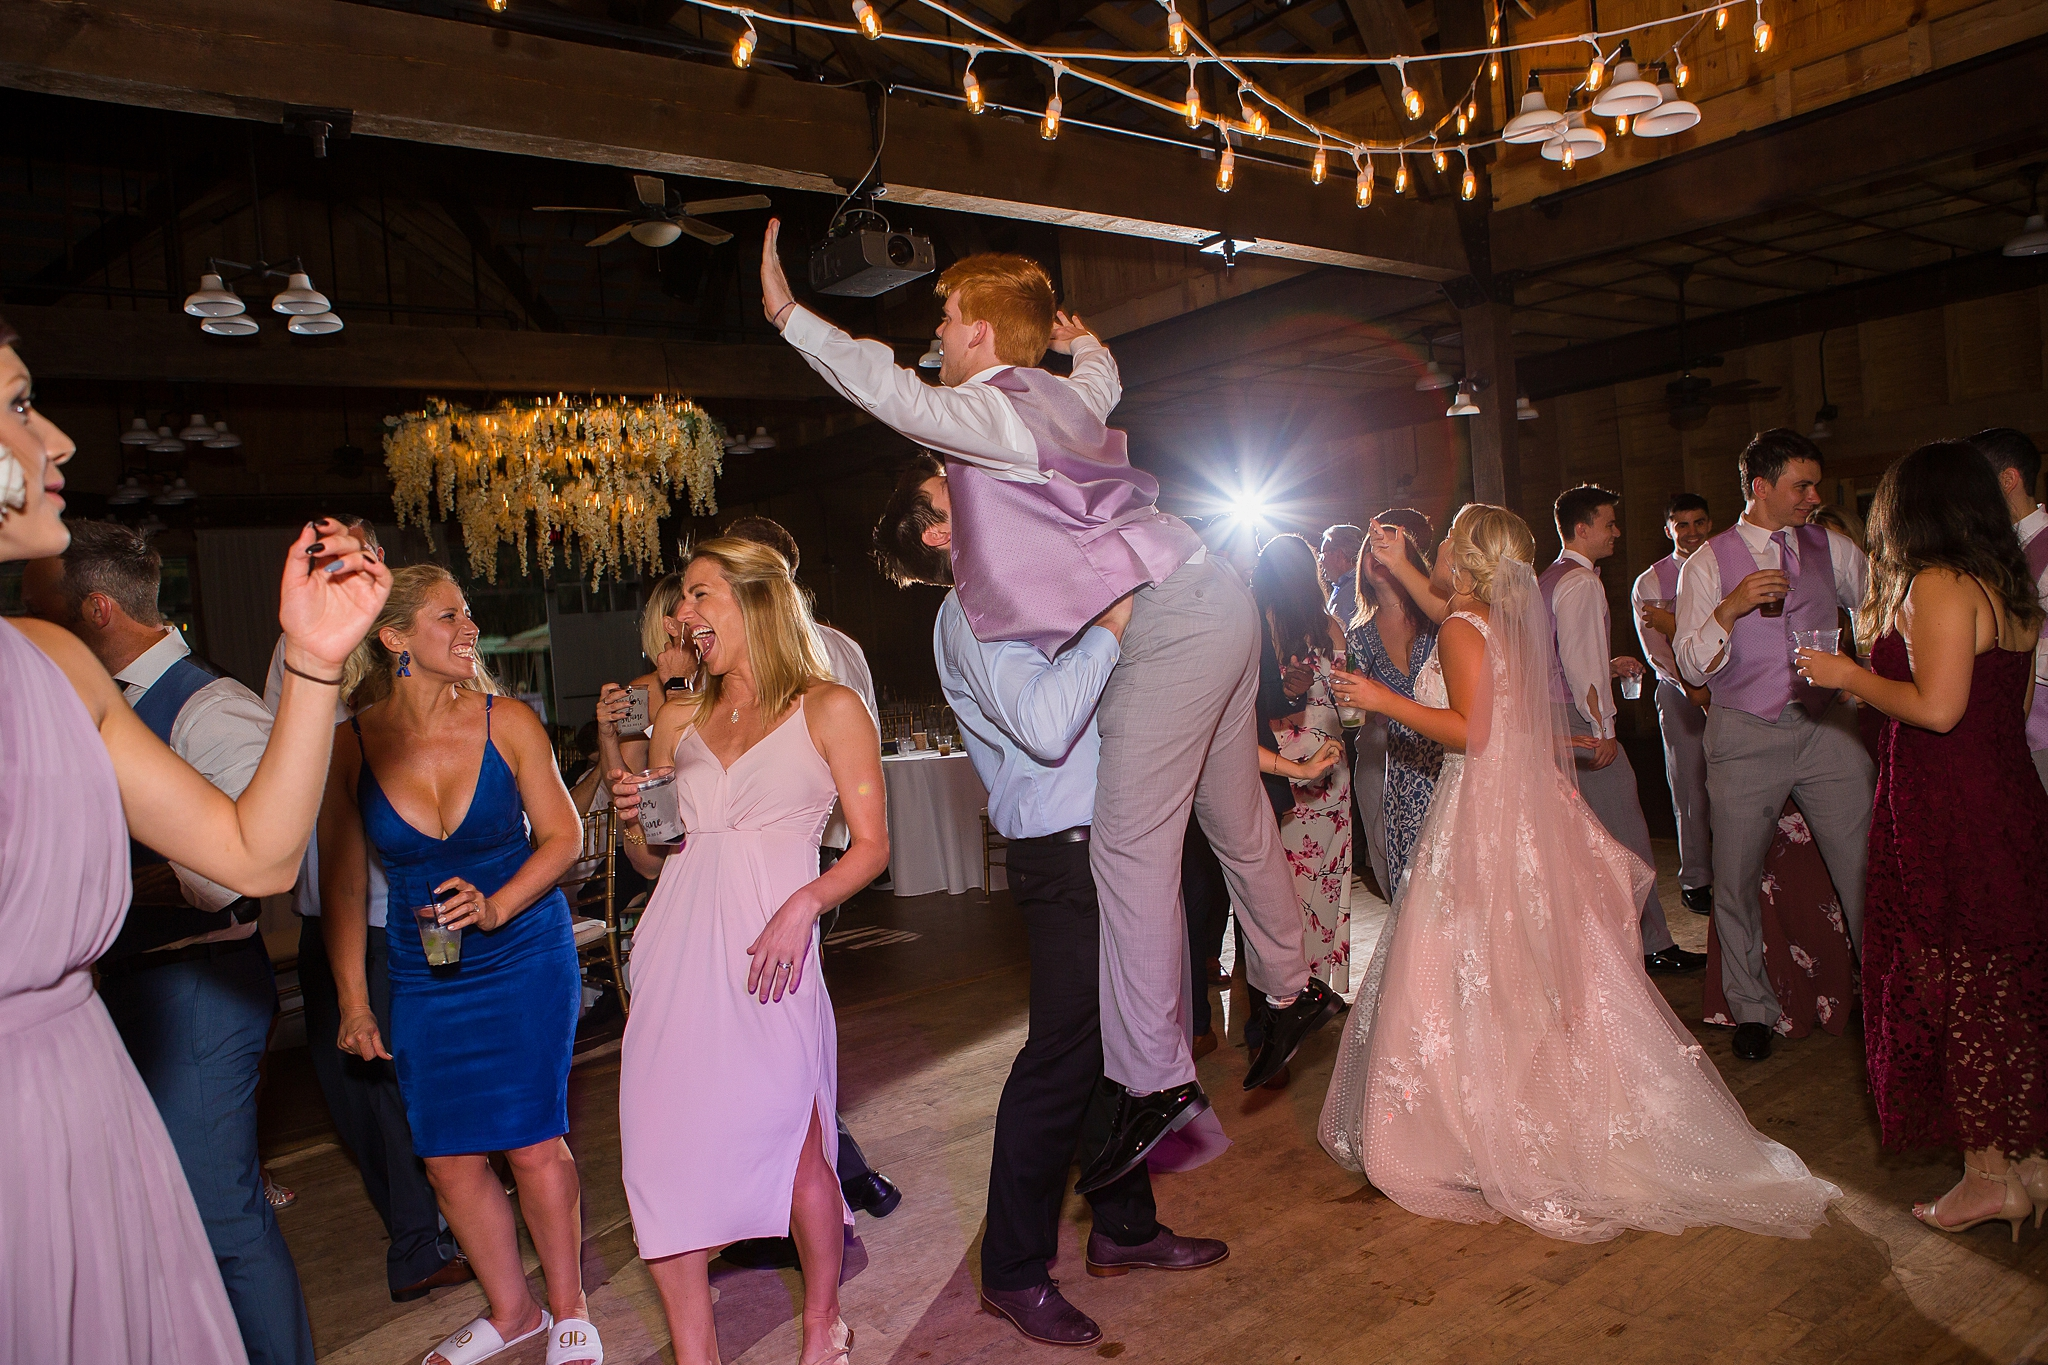 Charlotte_fristoe_wedding_photographer_tallahassee.jpg